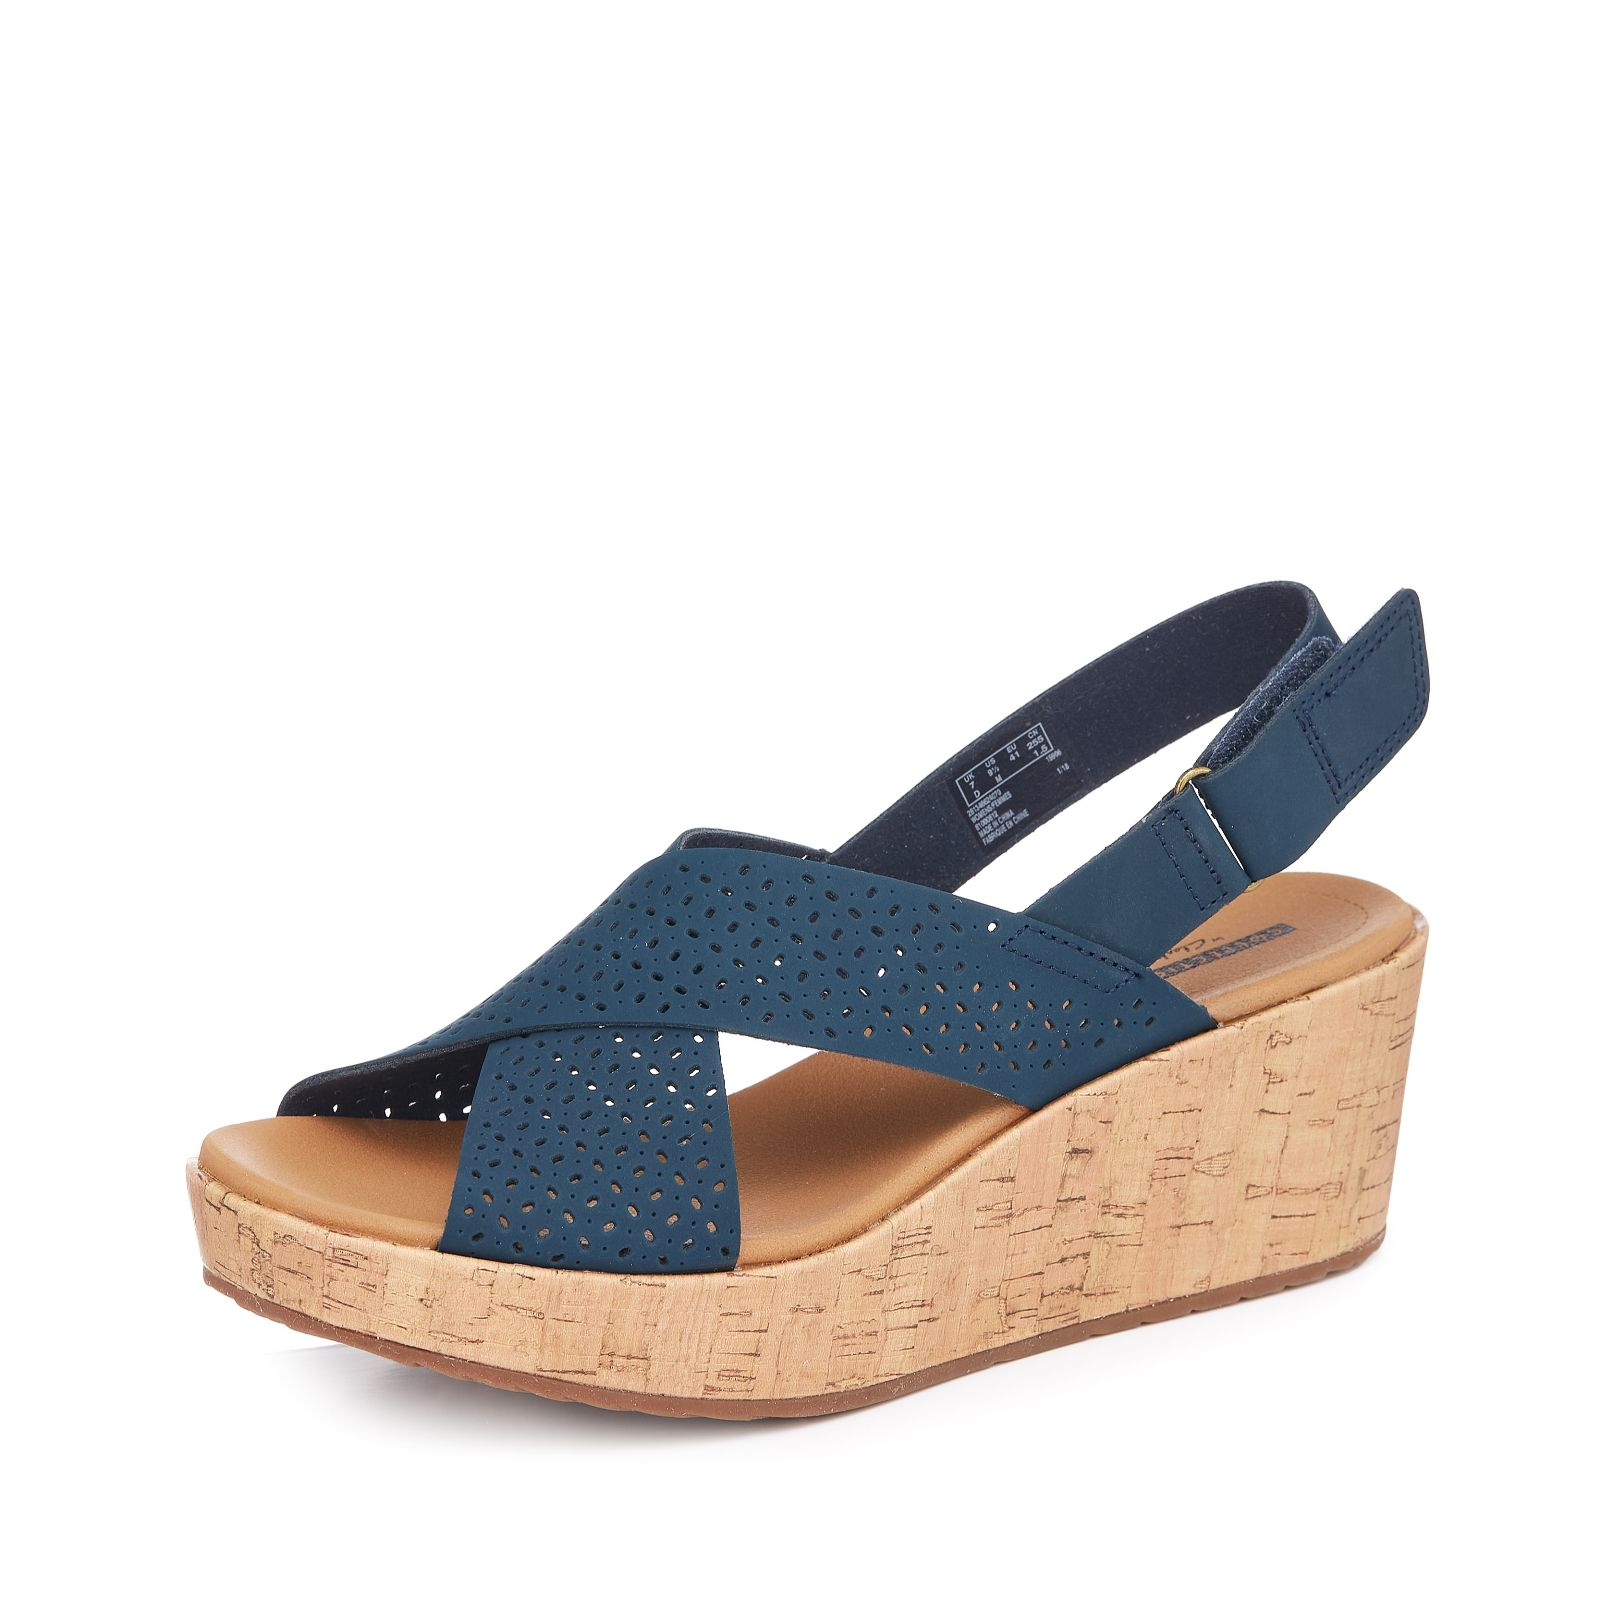 e945f345249 Clarks Laser Cut Leather Wedge Sandal Standard Fit - QVC UK